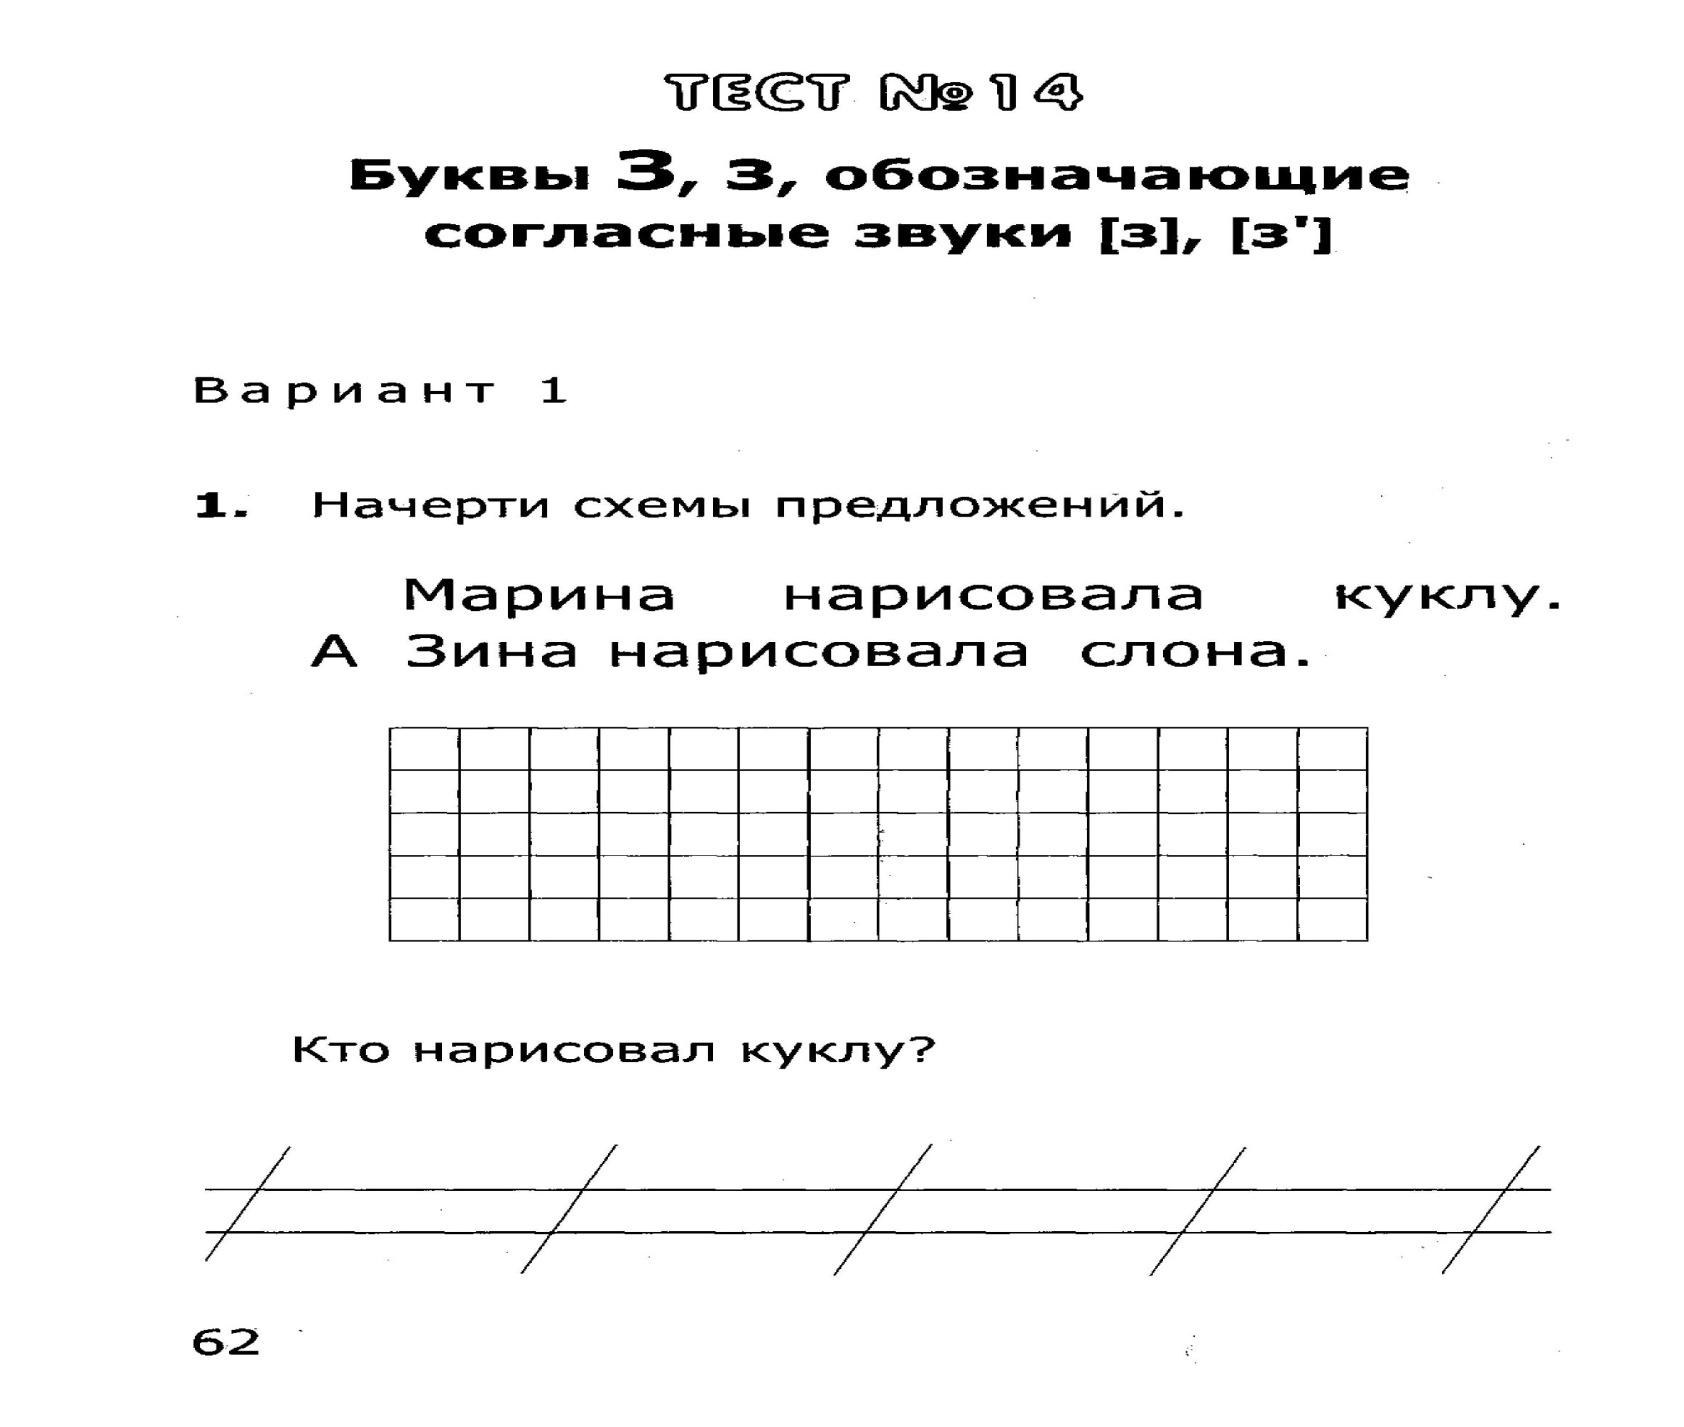 0 - 0064